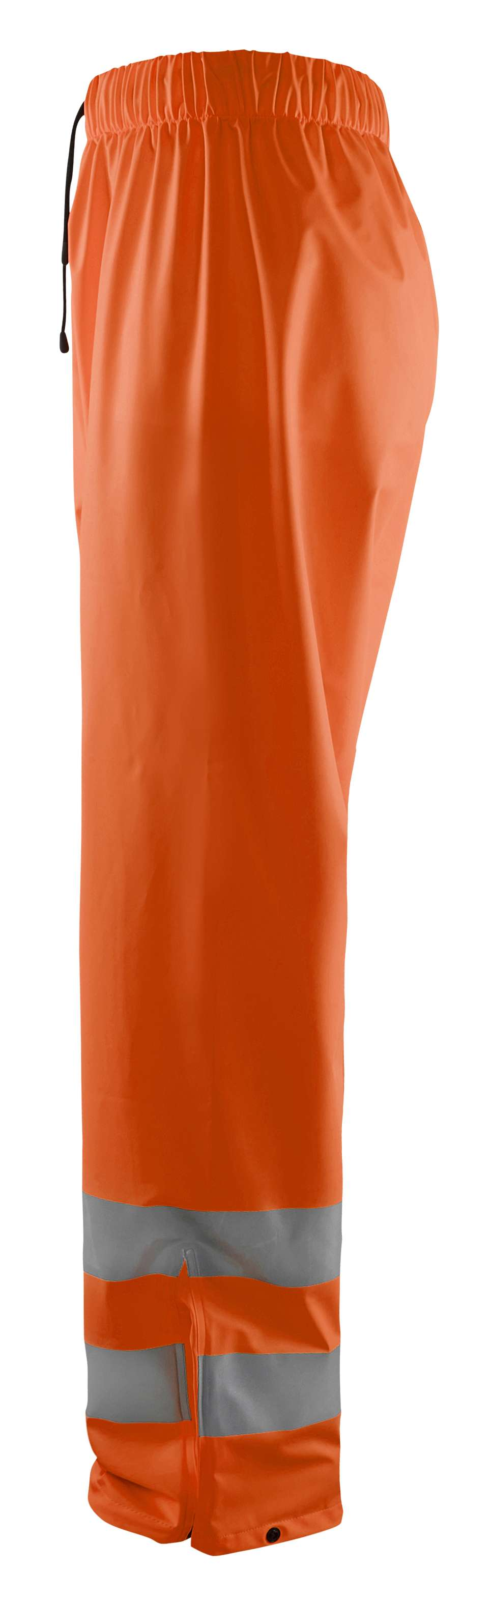 Blaklader Regenbroeken 13842000 High Vis oranje(5300)